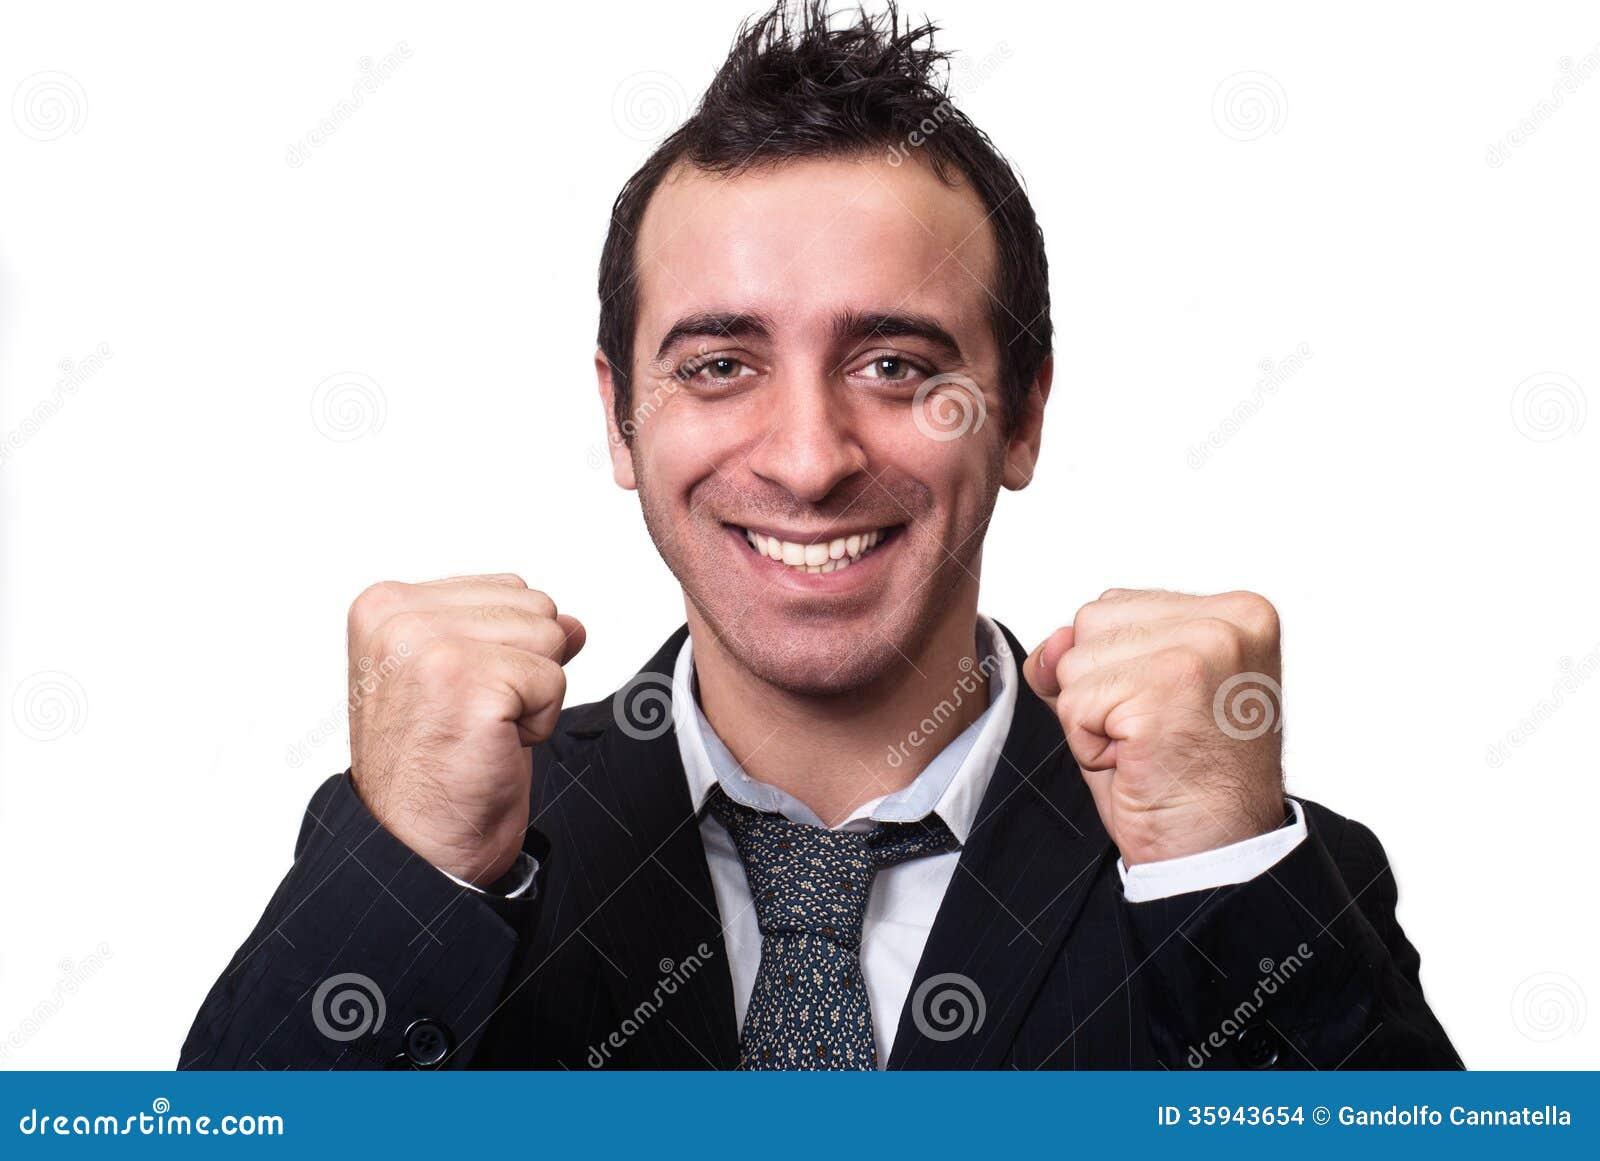 Young businessman enjoying success isolated on white